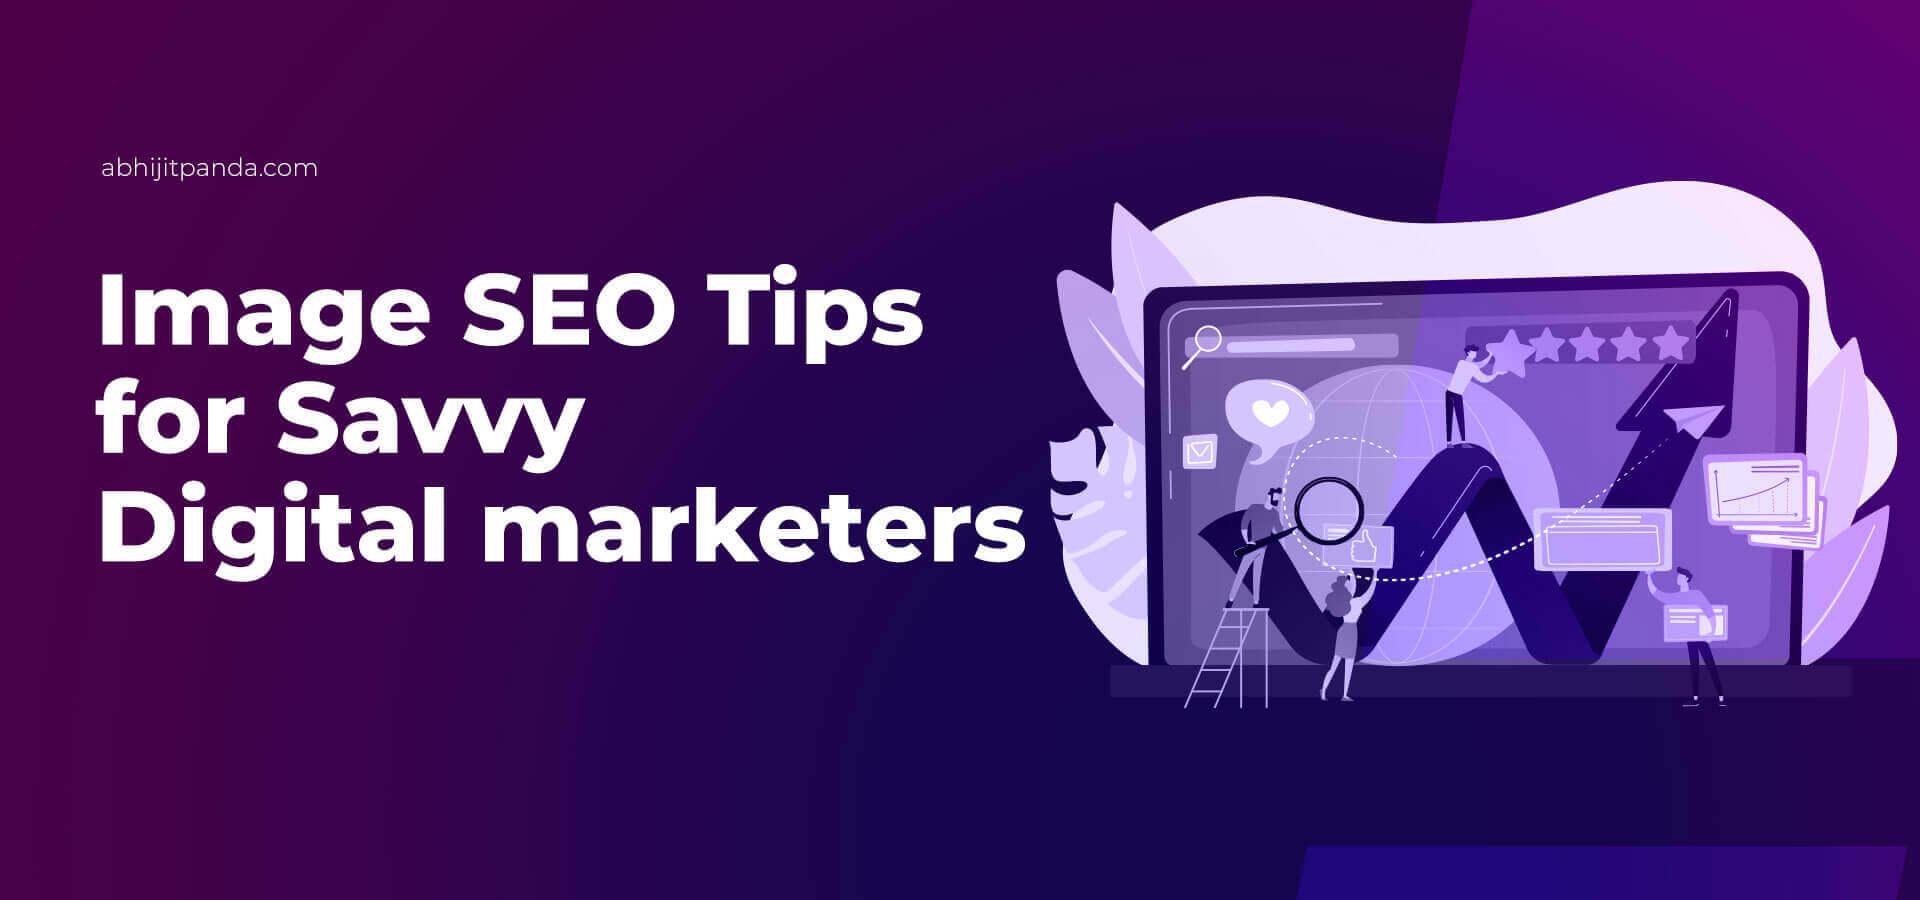 Image SEO Tips